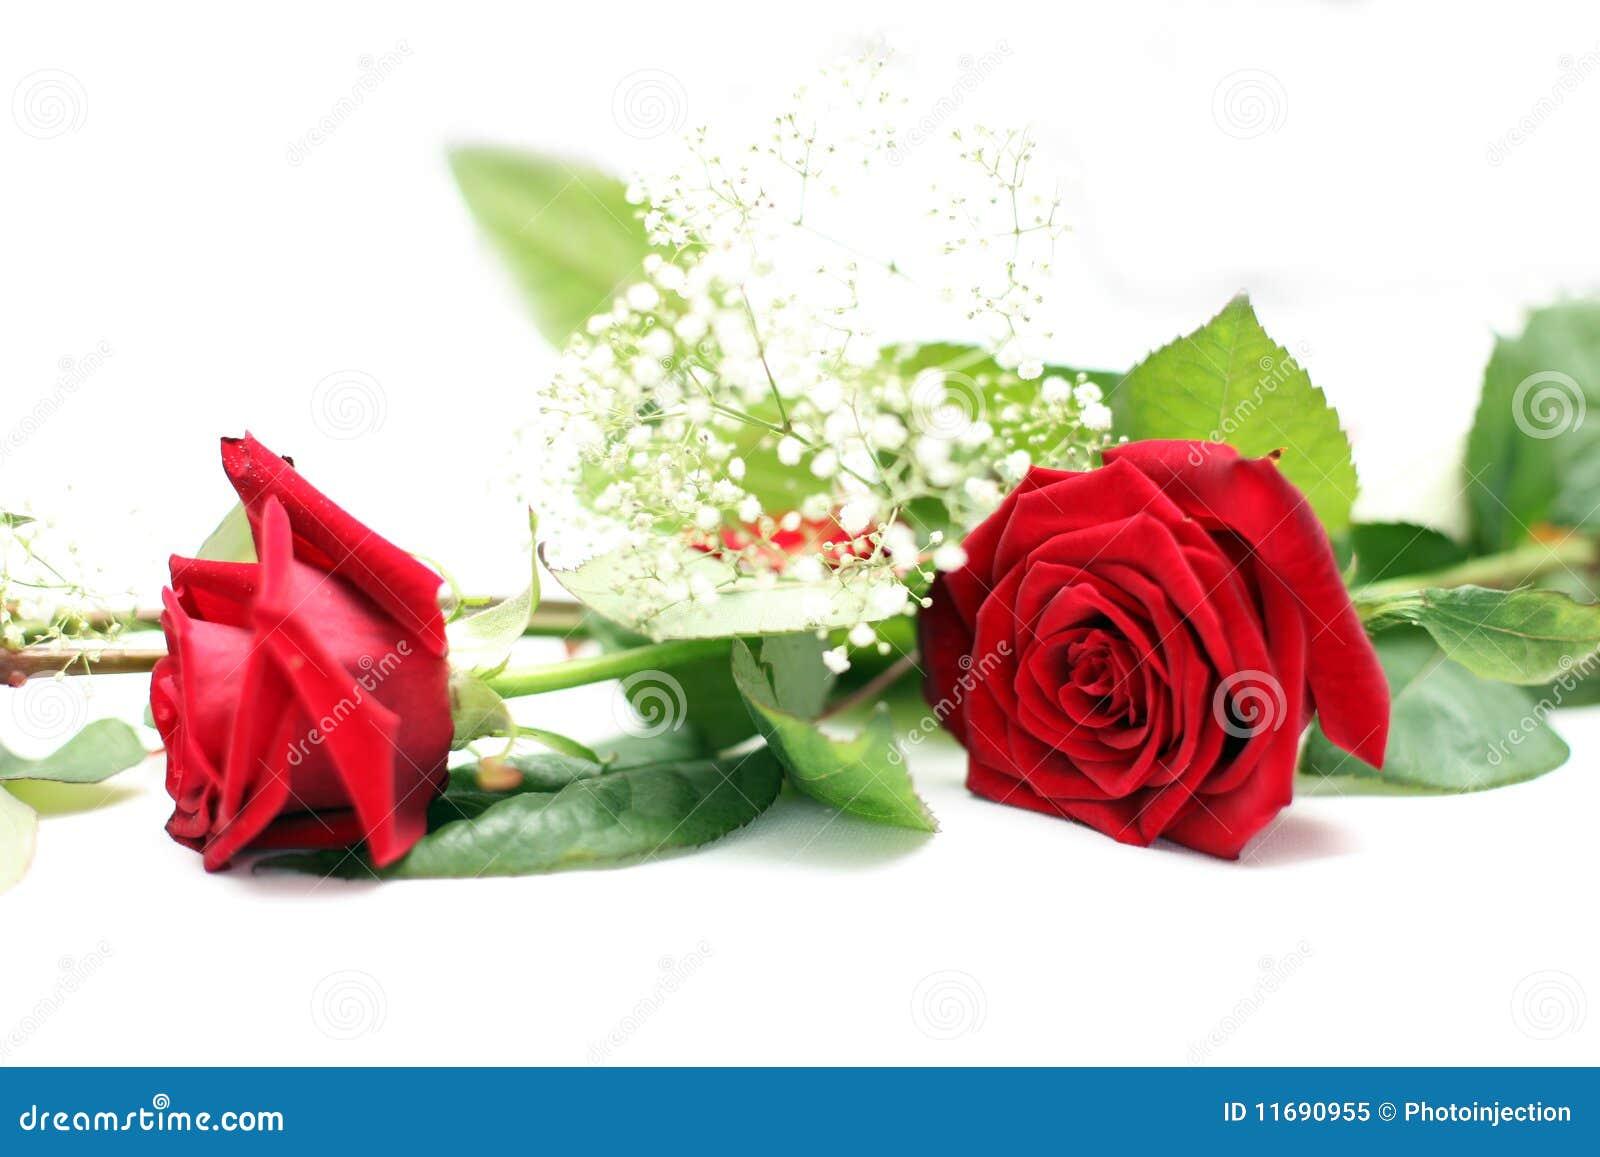 Wedding table decoration rose stock image image 11690955 - Deco table rose ...